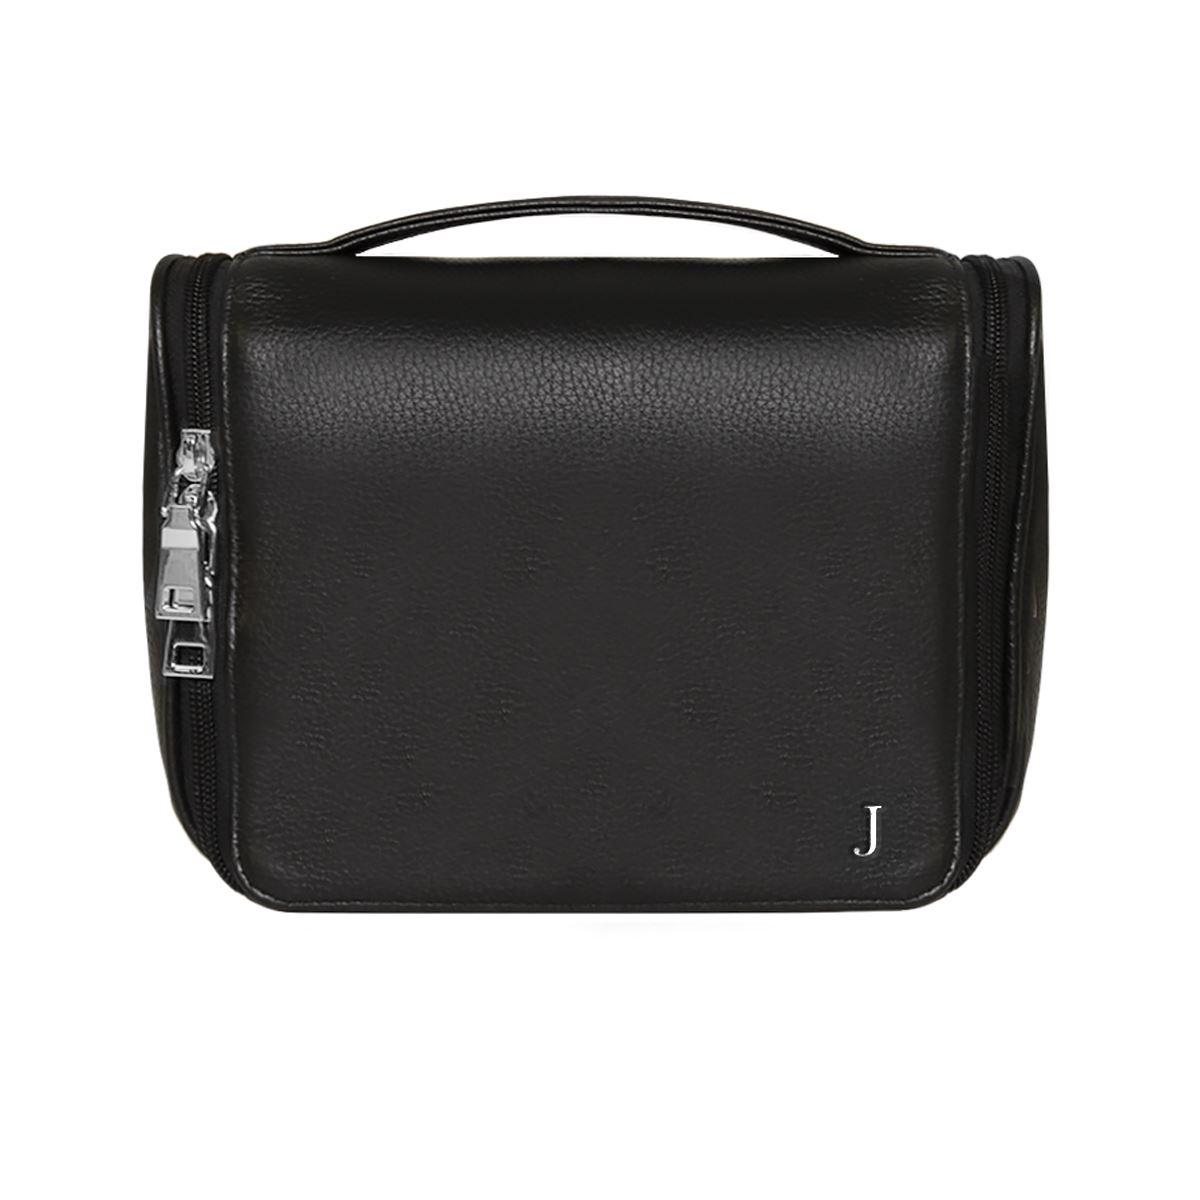 Grainy Leather Travel Wash Bag